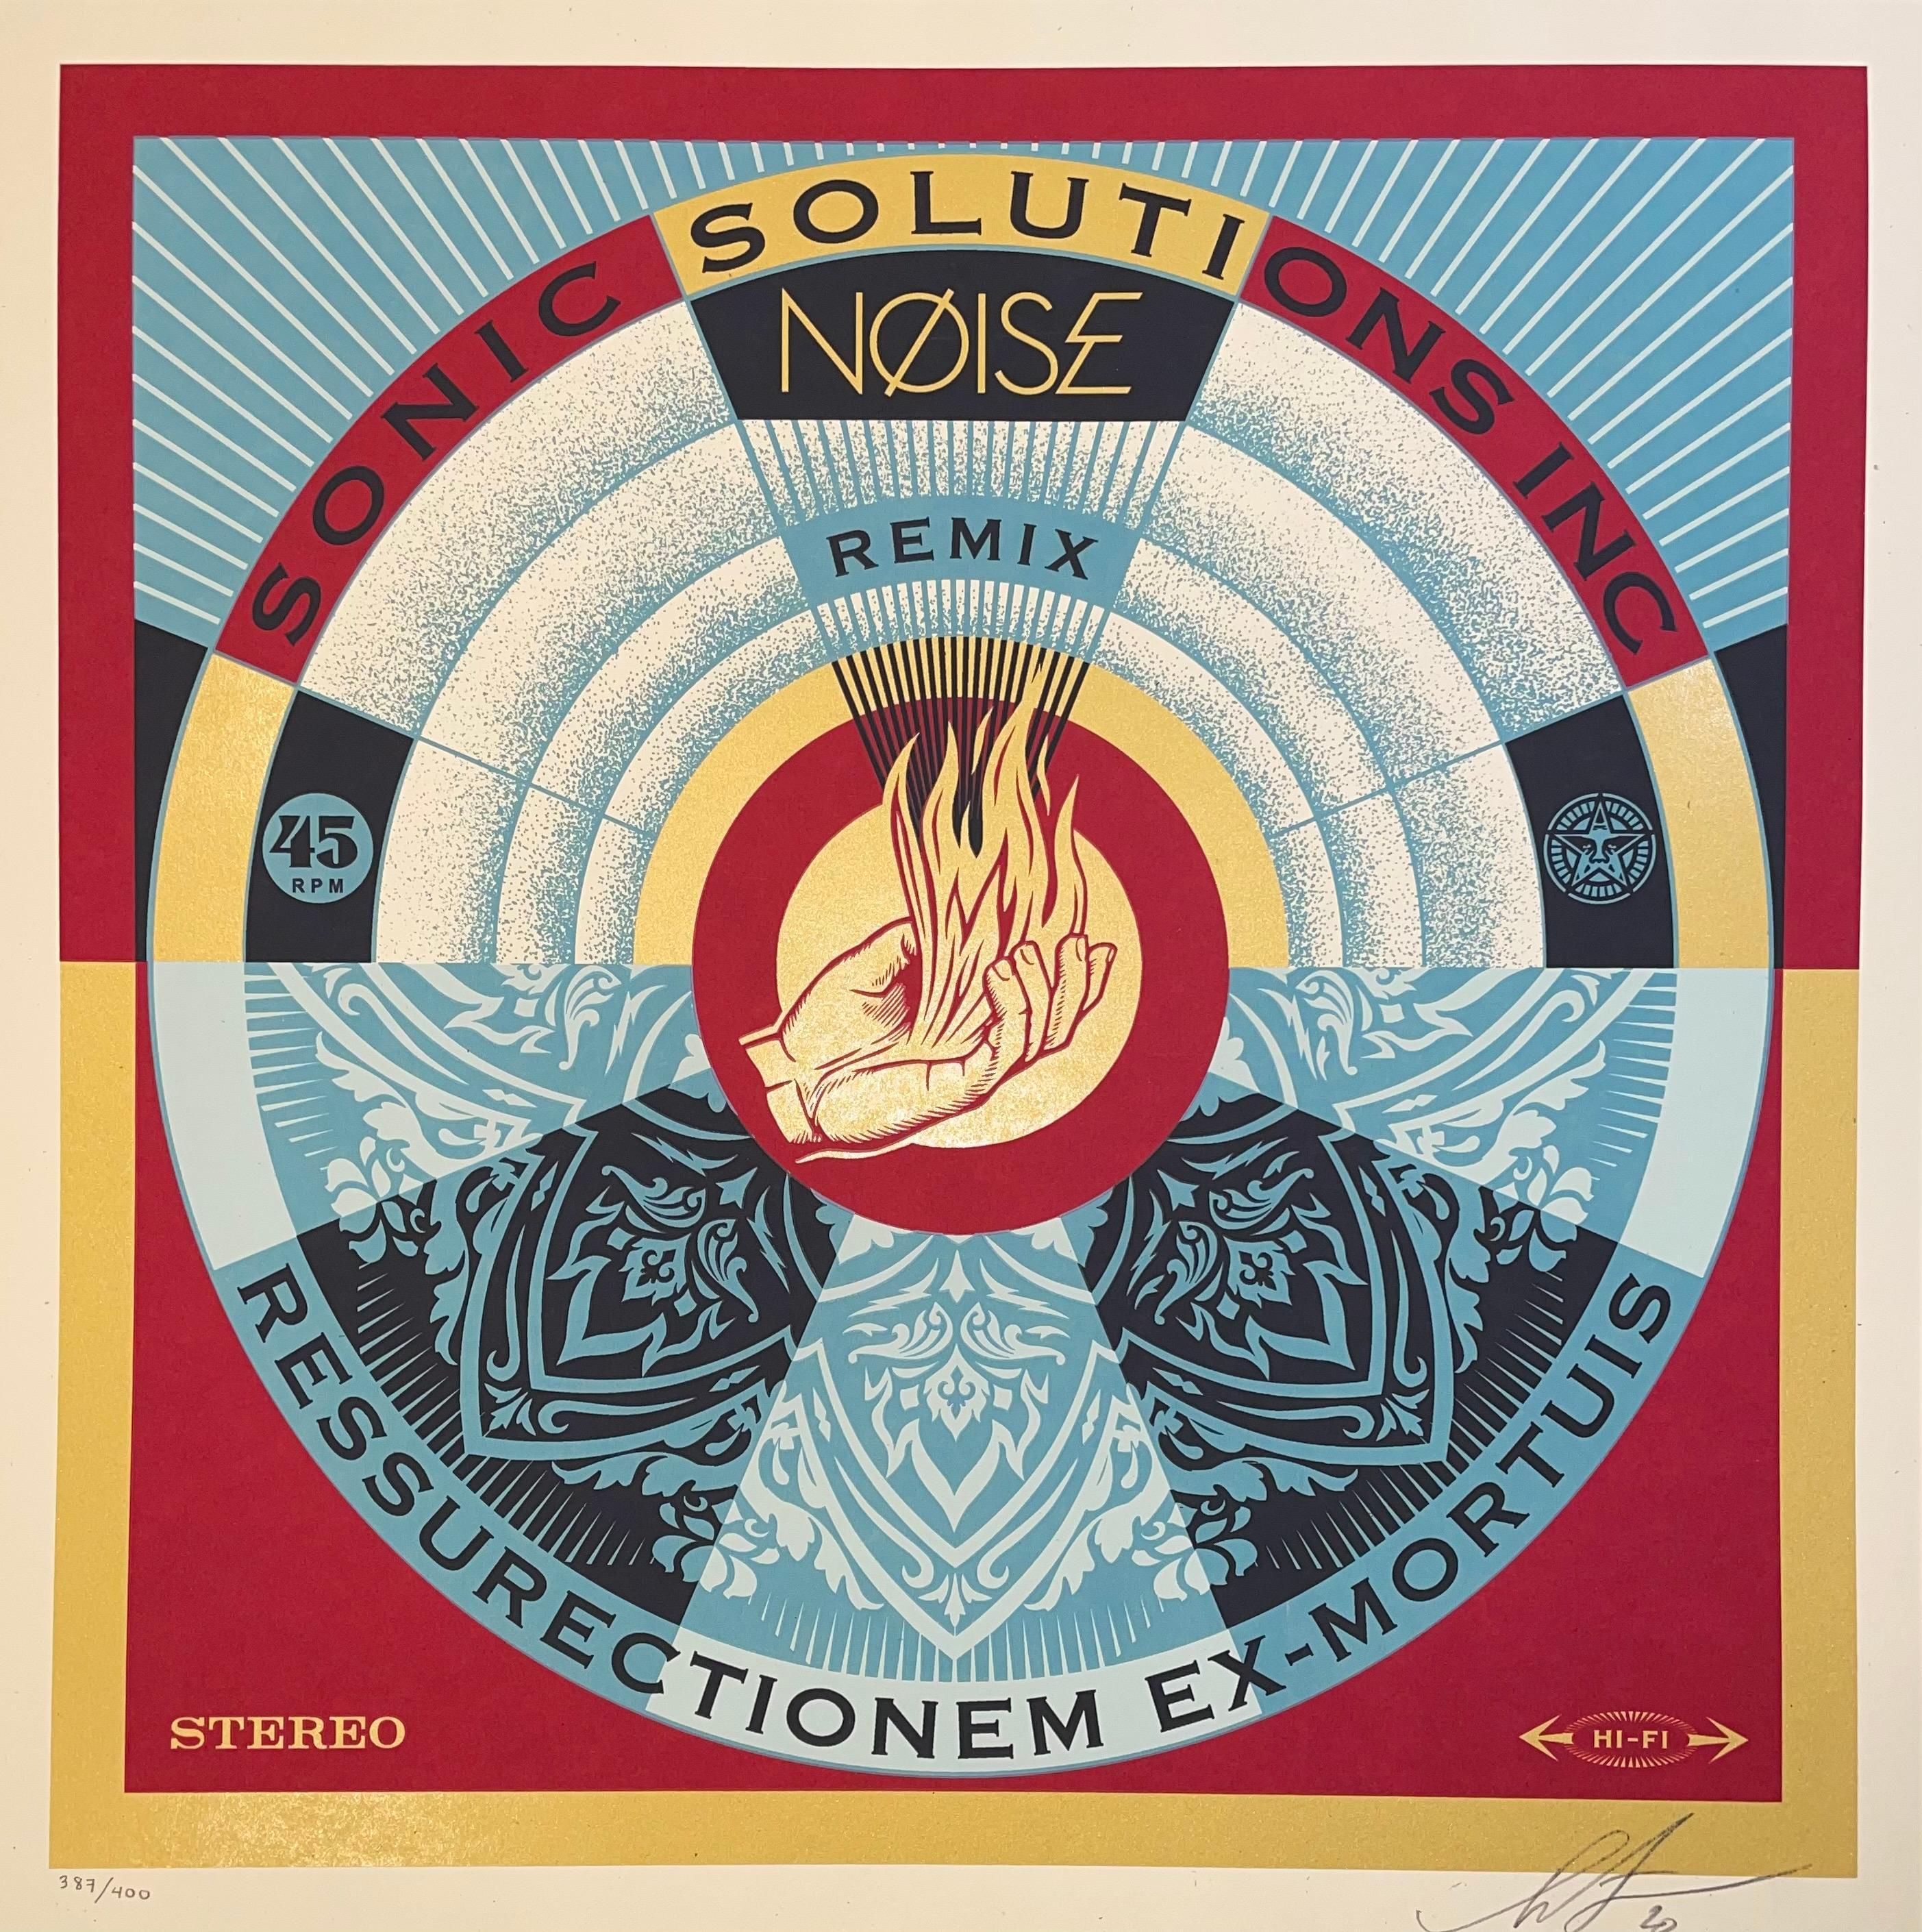 Shepard Fairey Print Signed & Numbered NØISE/SSI Resurrectionem Ex-Mortuis Remix